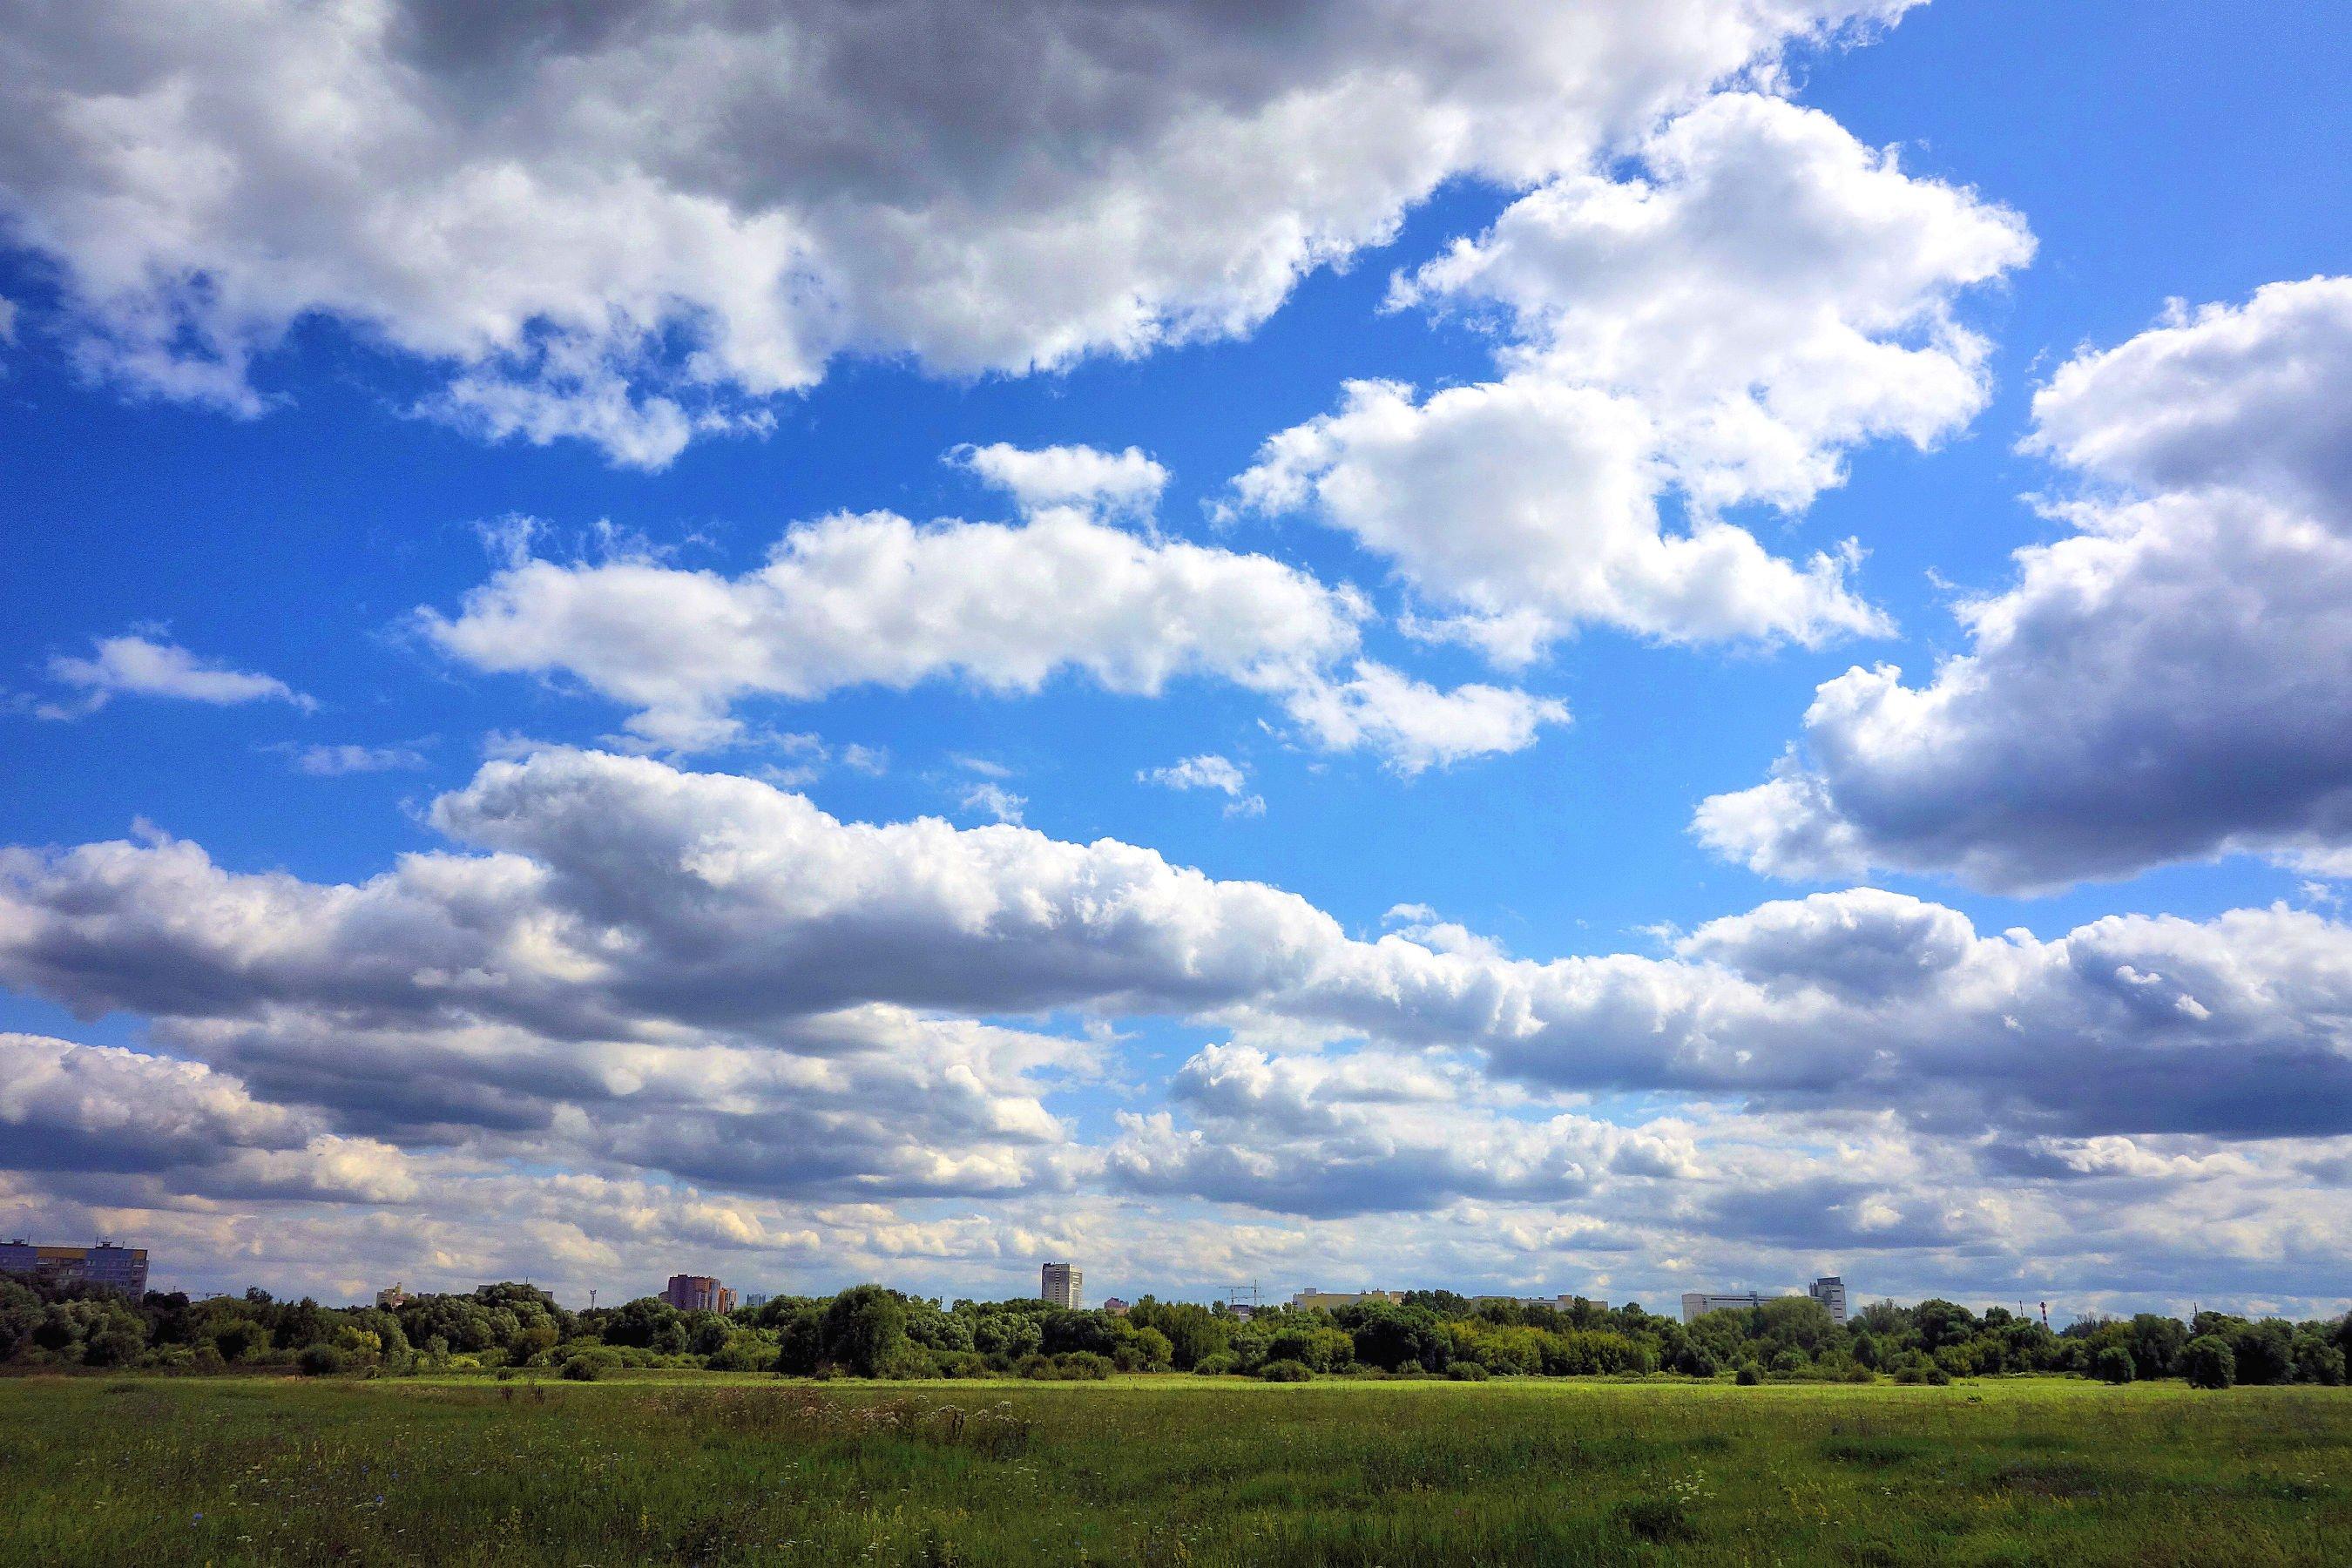 заявку над нами небо голубое картинки нас